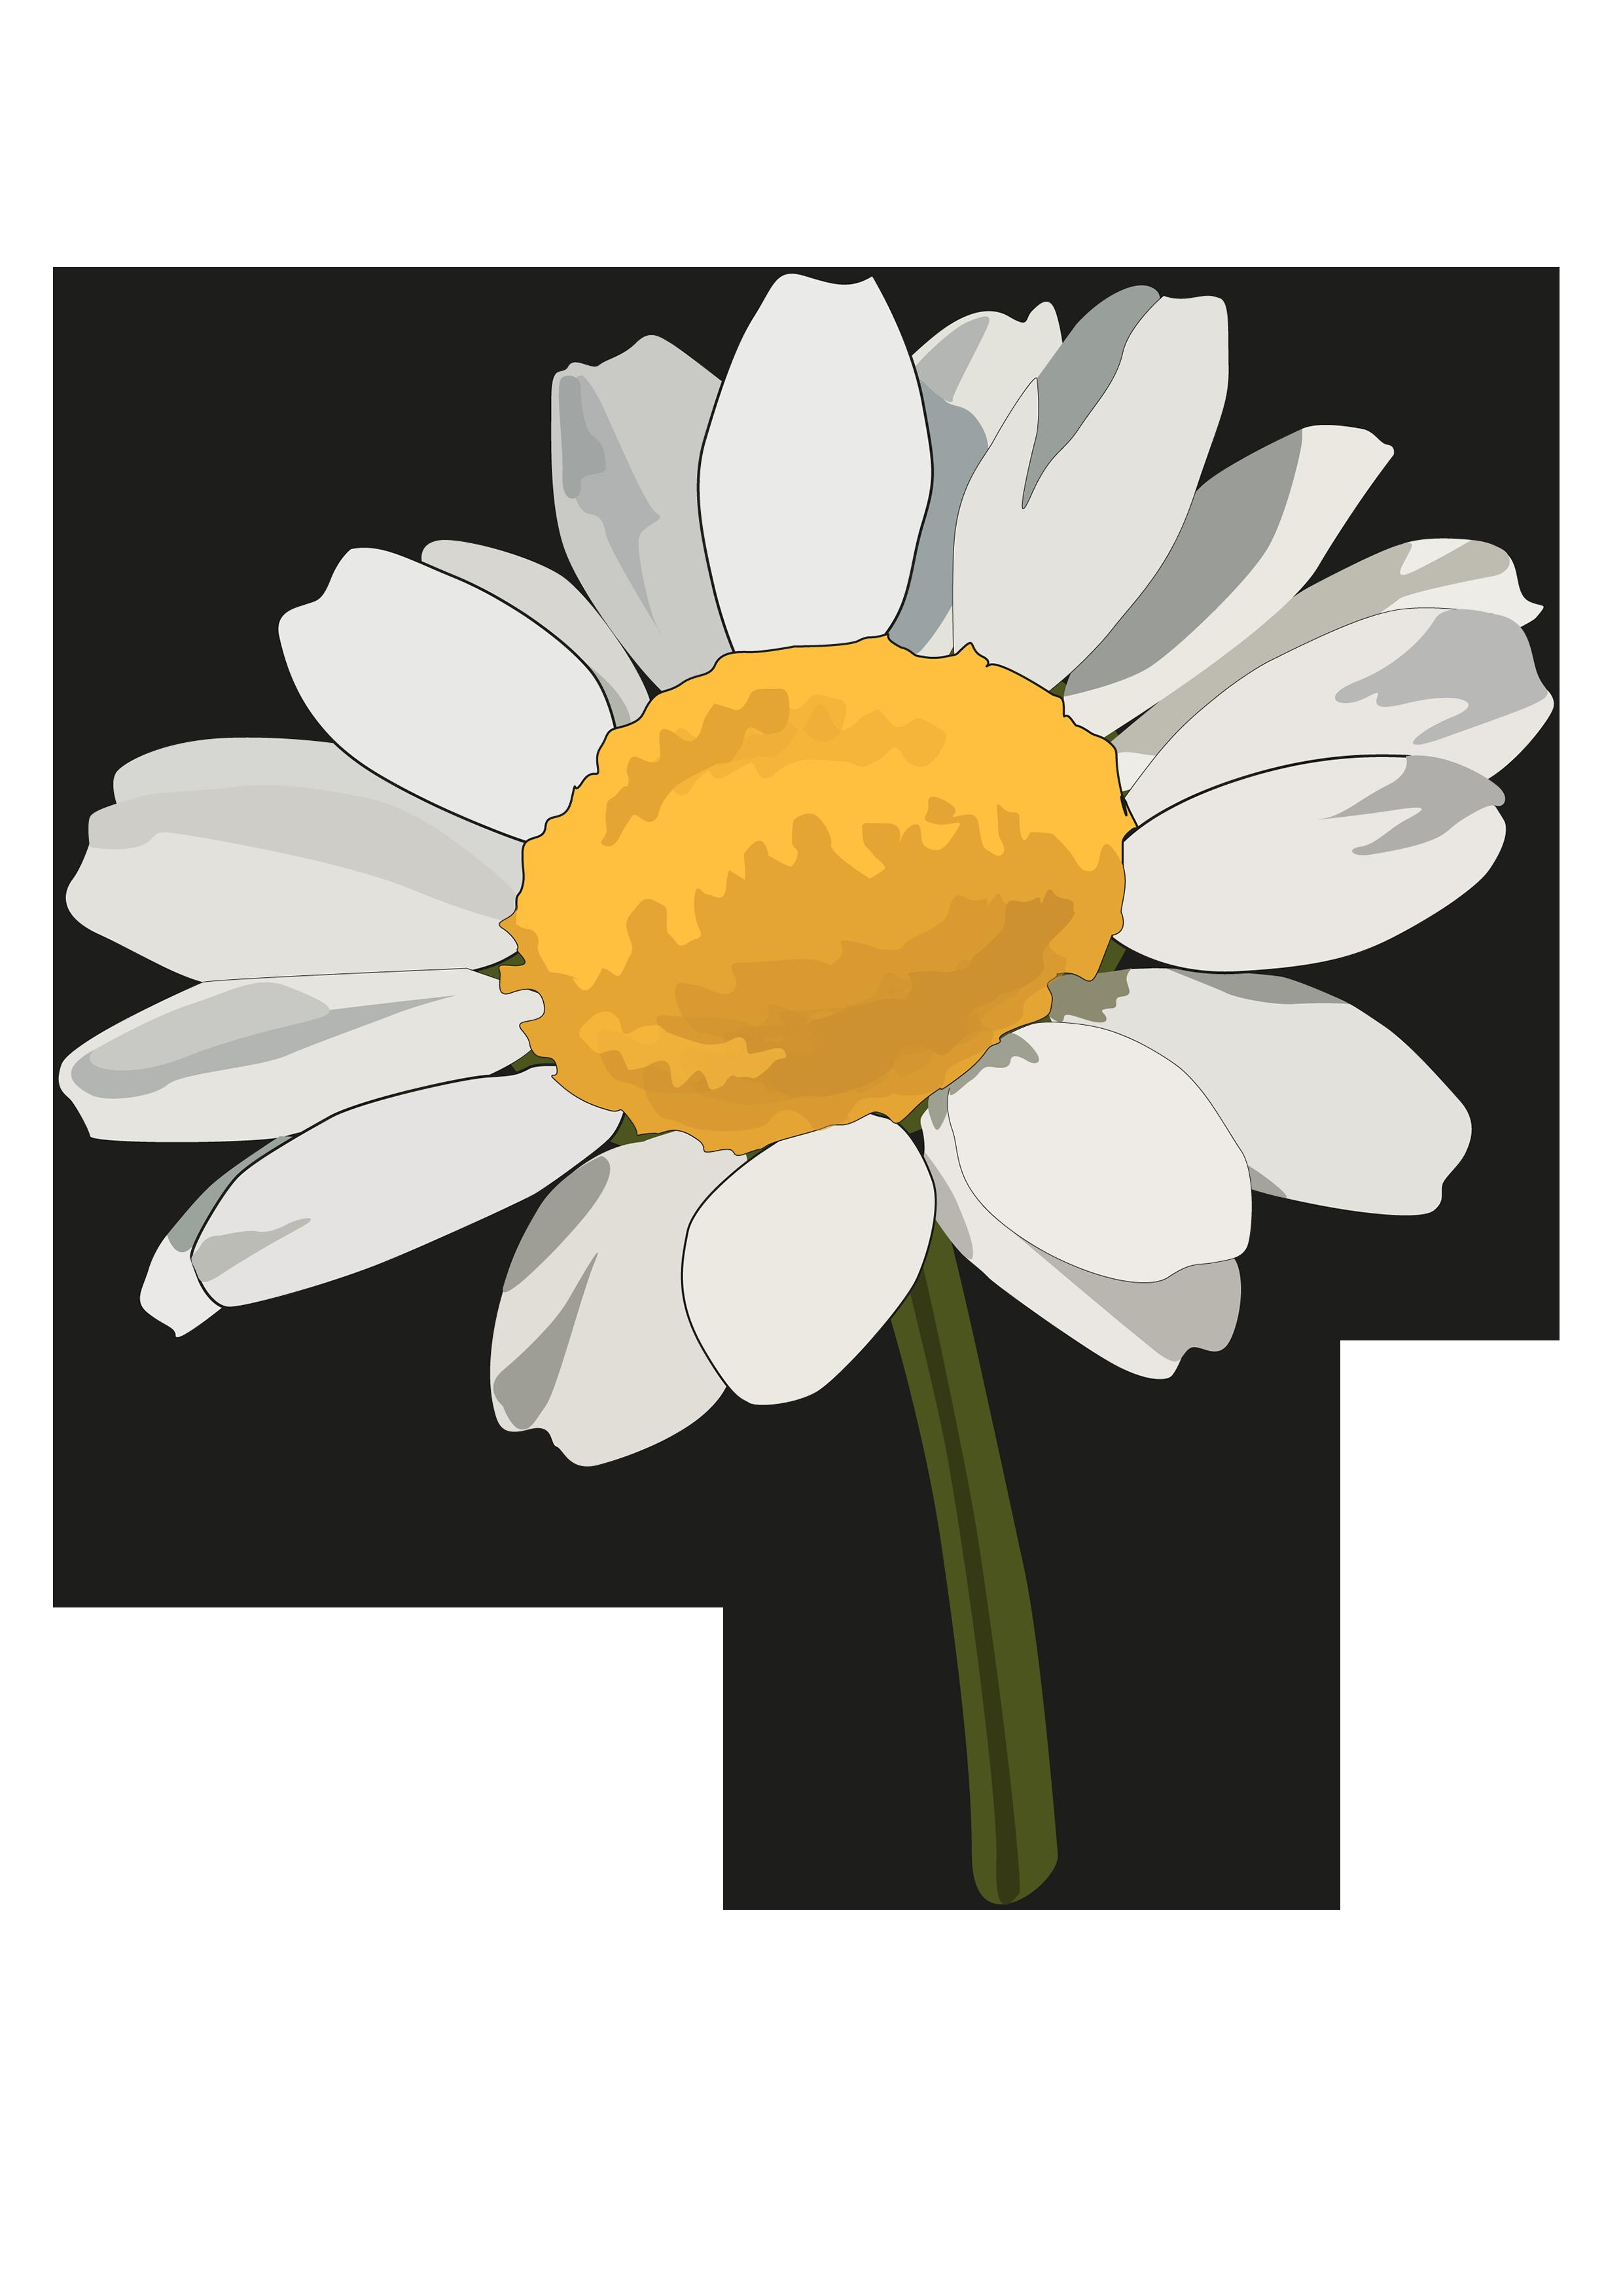 Lámina: Flores » Recursos educativos digitales